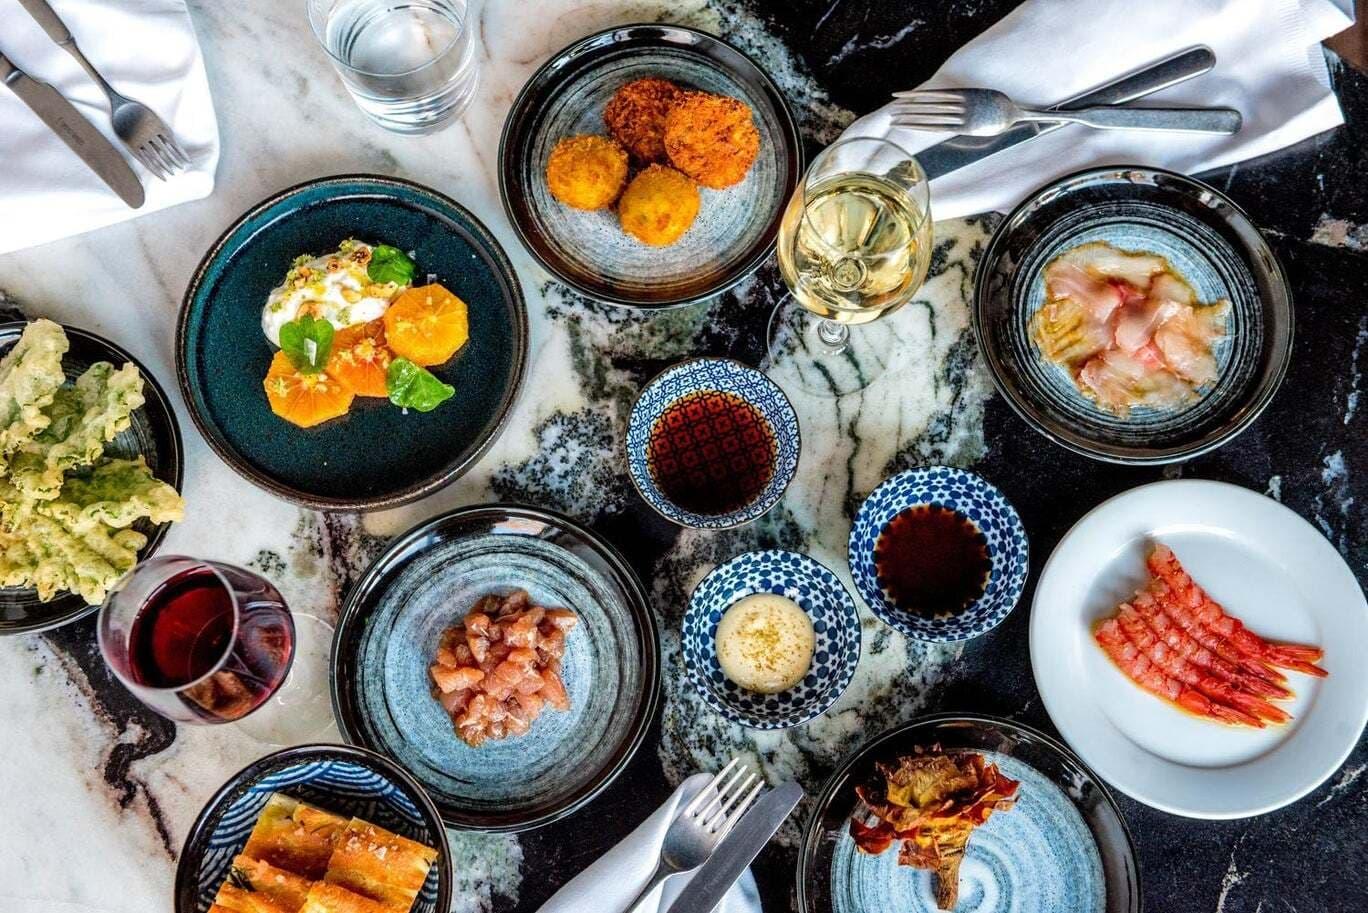 Italian-Japanese inspired menu at Angelina Restaurant, Dalston, London